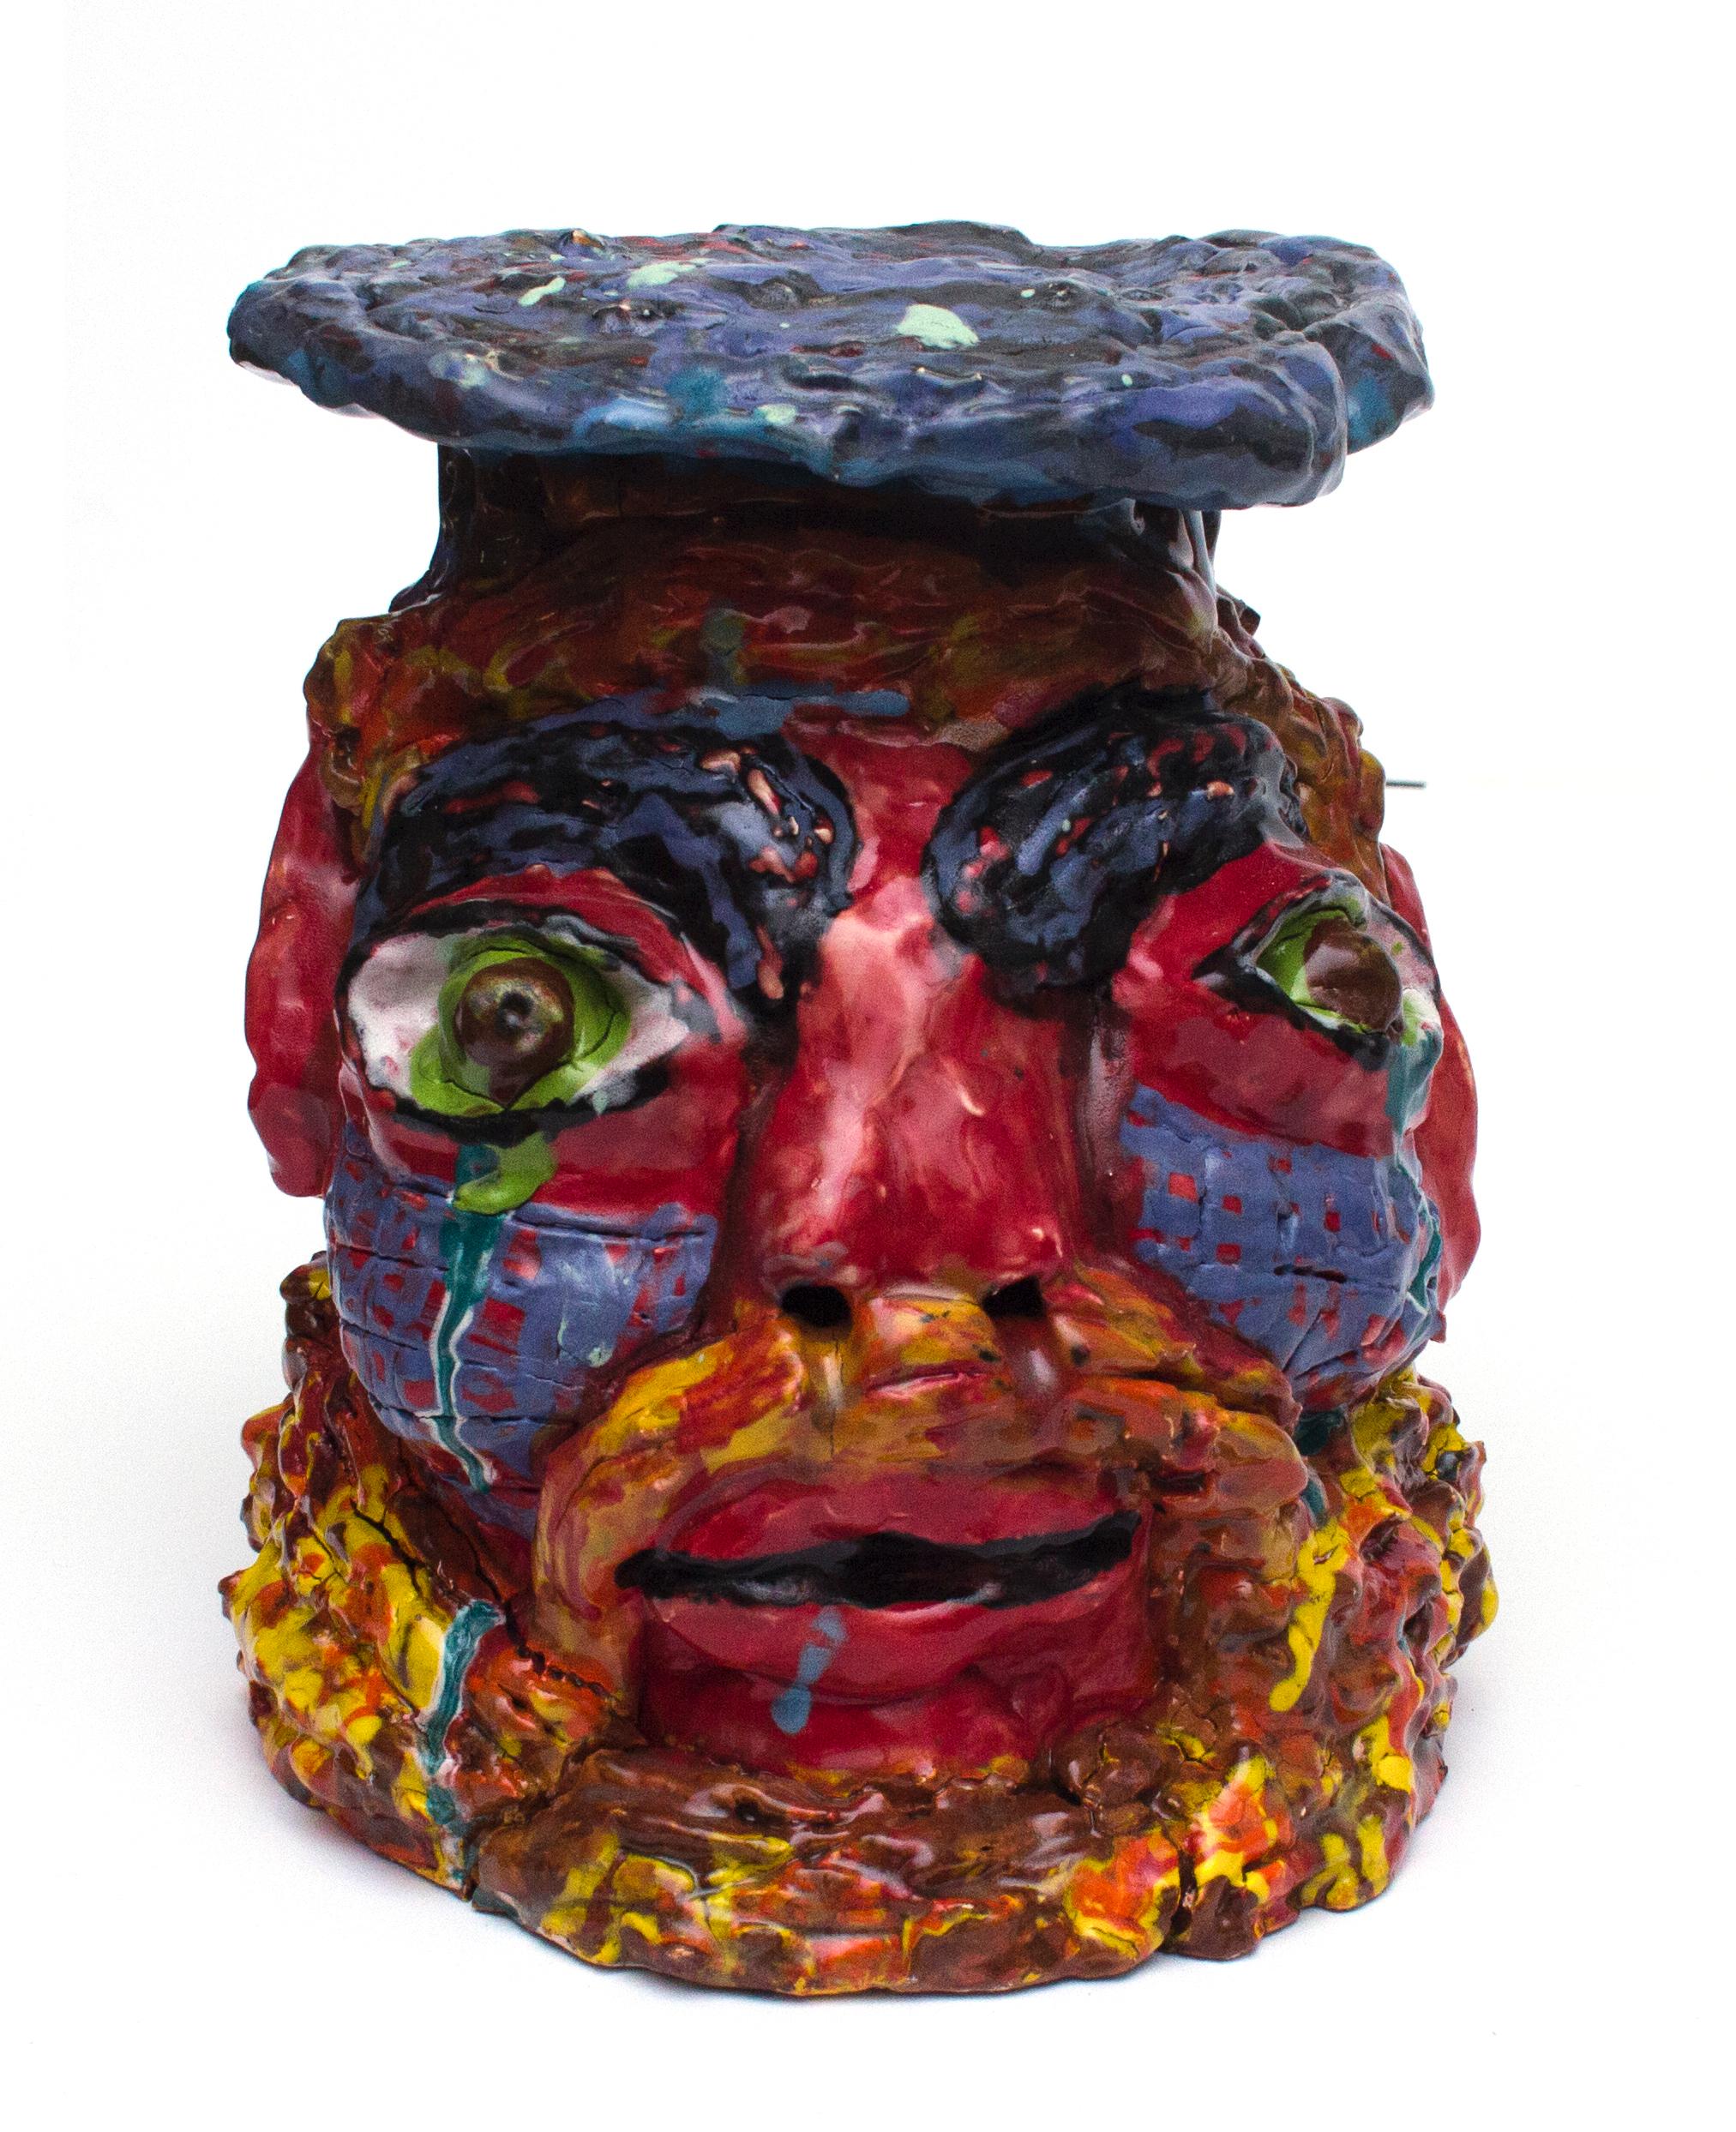 Jorge Gomez, Untitled (JG 049), 2019, Ceramic, 7 x 7 x 10 inches